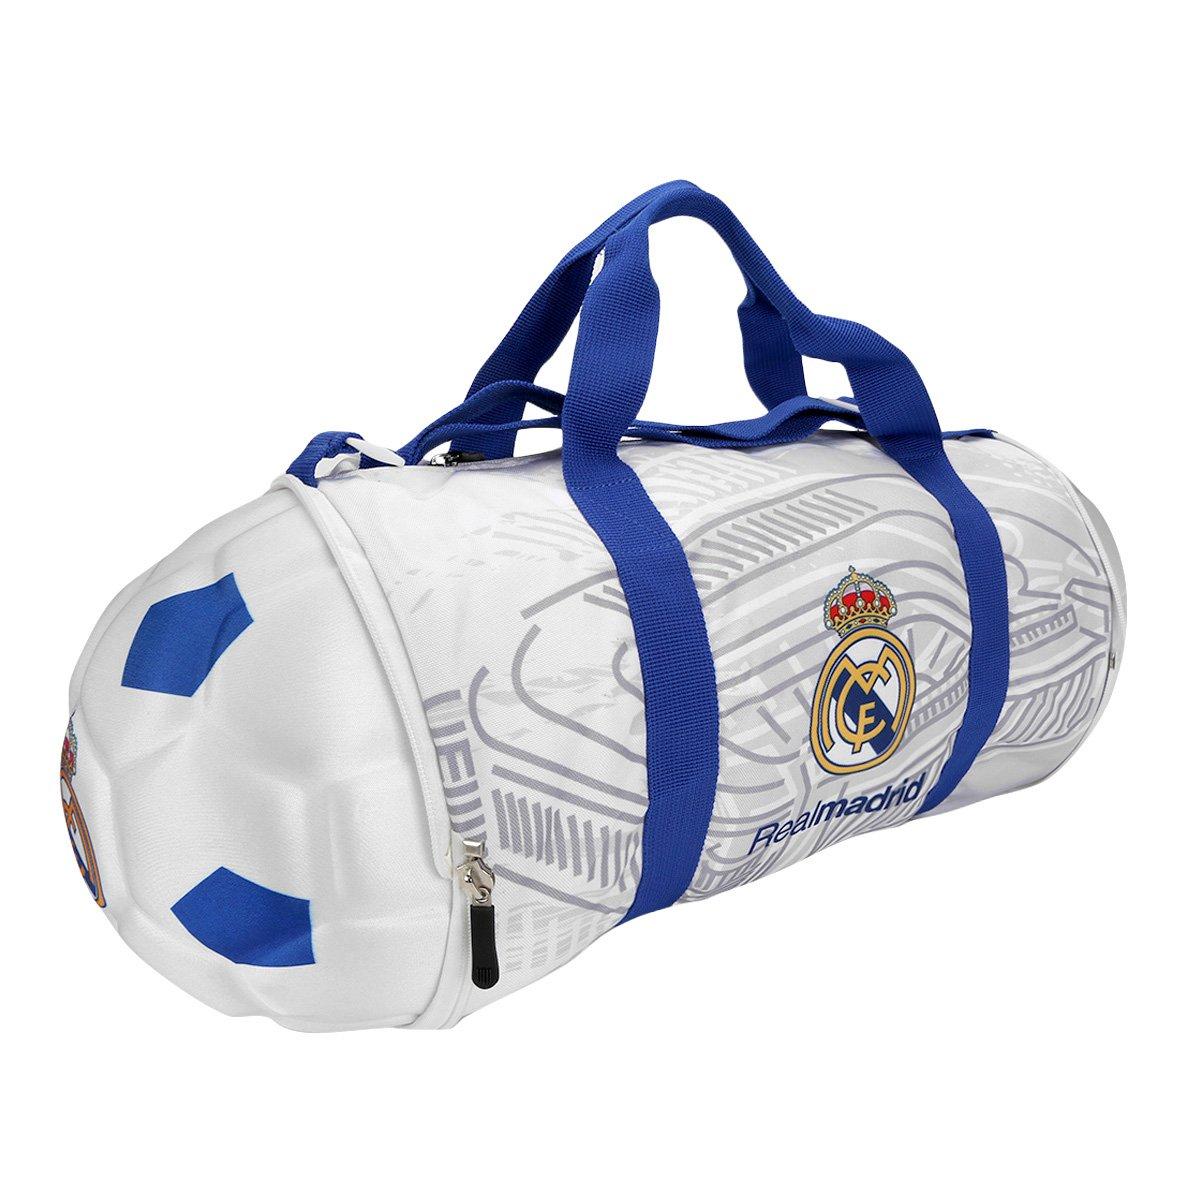 72b7a1bc46 Bolsa Real Madrid Academia  Bolsa Real Madrid Academia ...